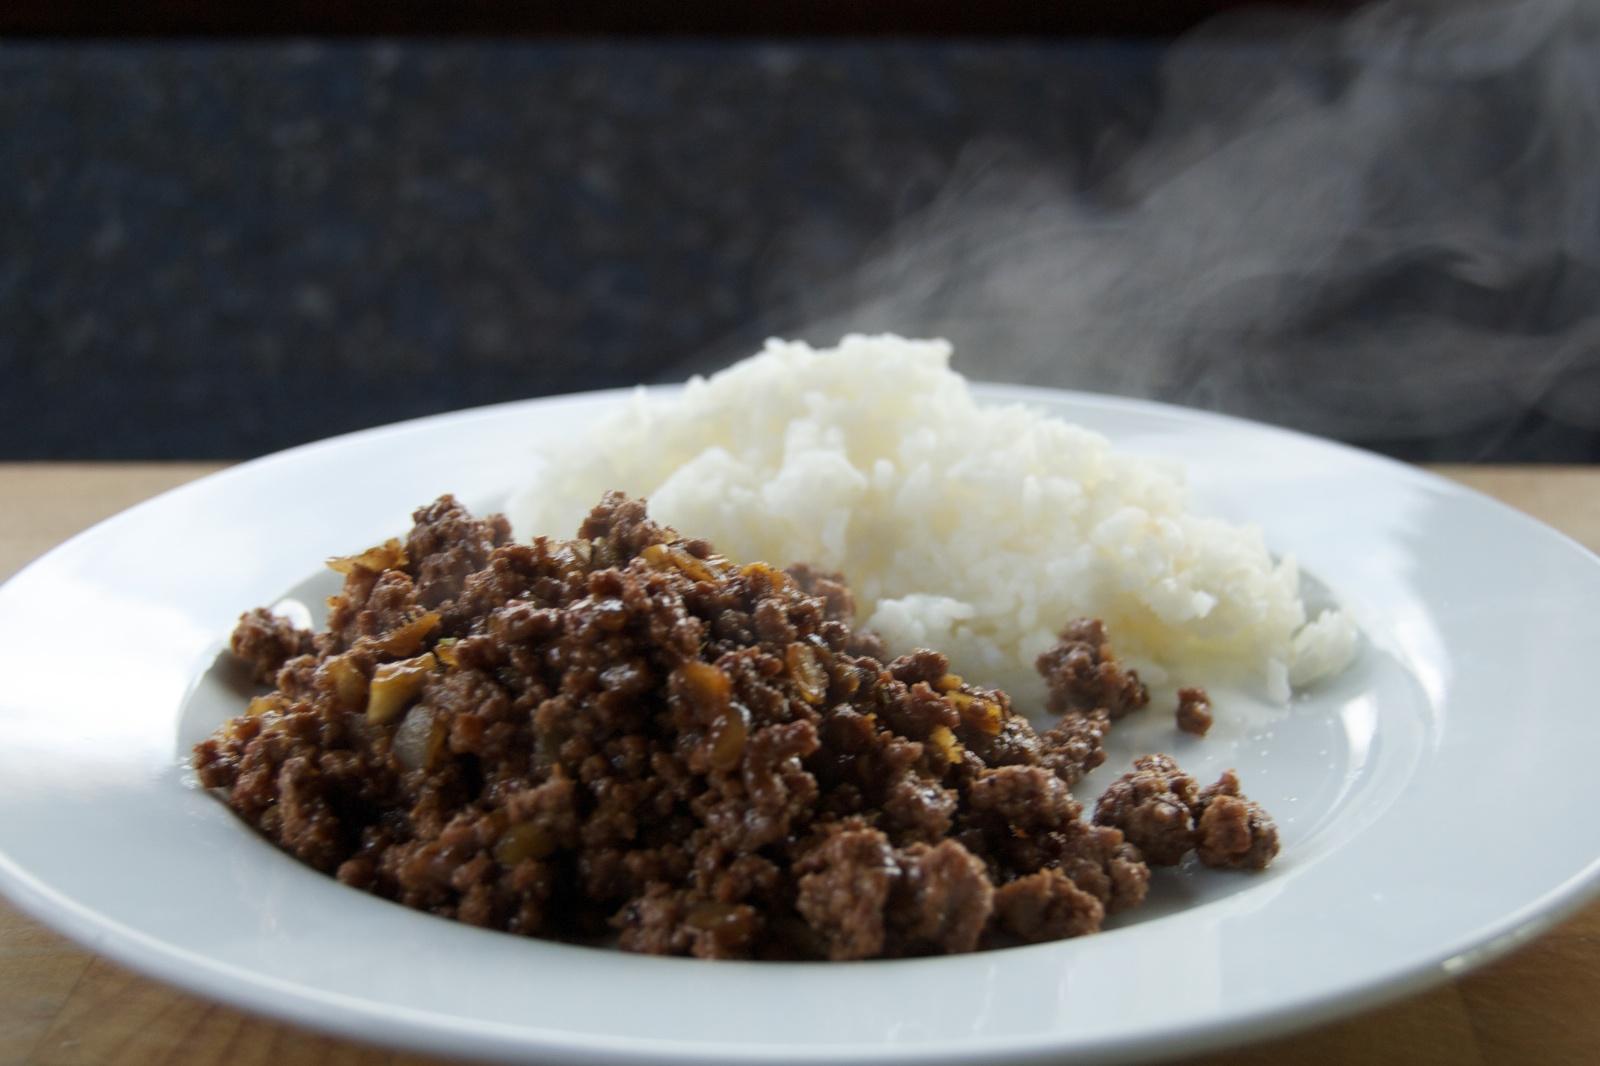 http://blog.rickk.com/food/2014/01/15/ate.2014.01.15.l.jpg